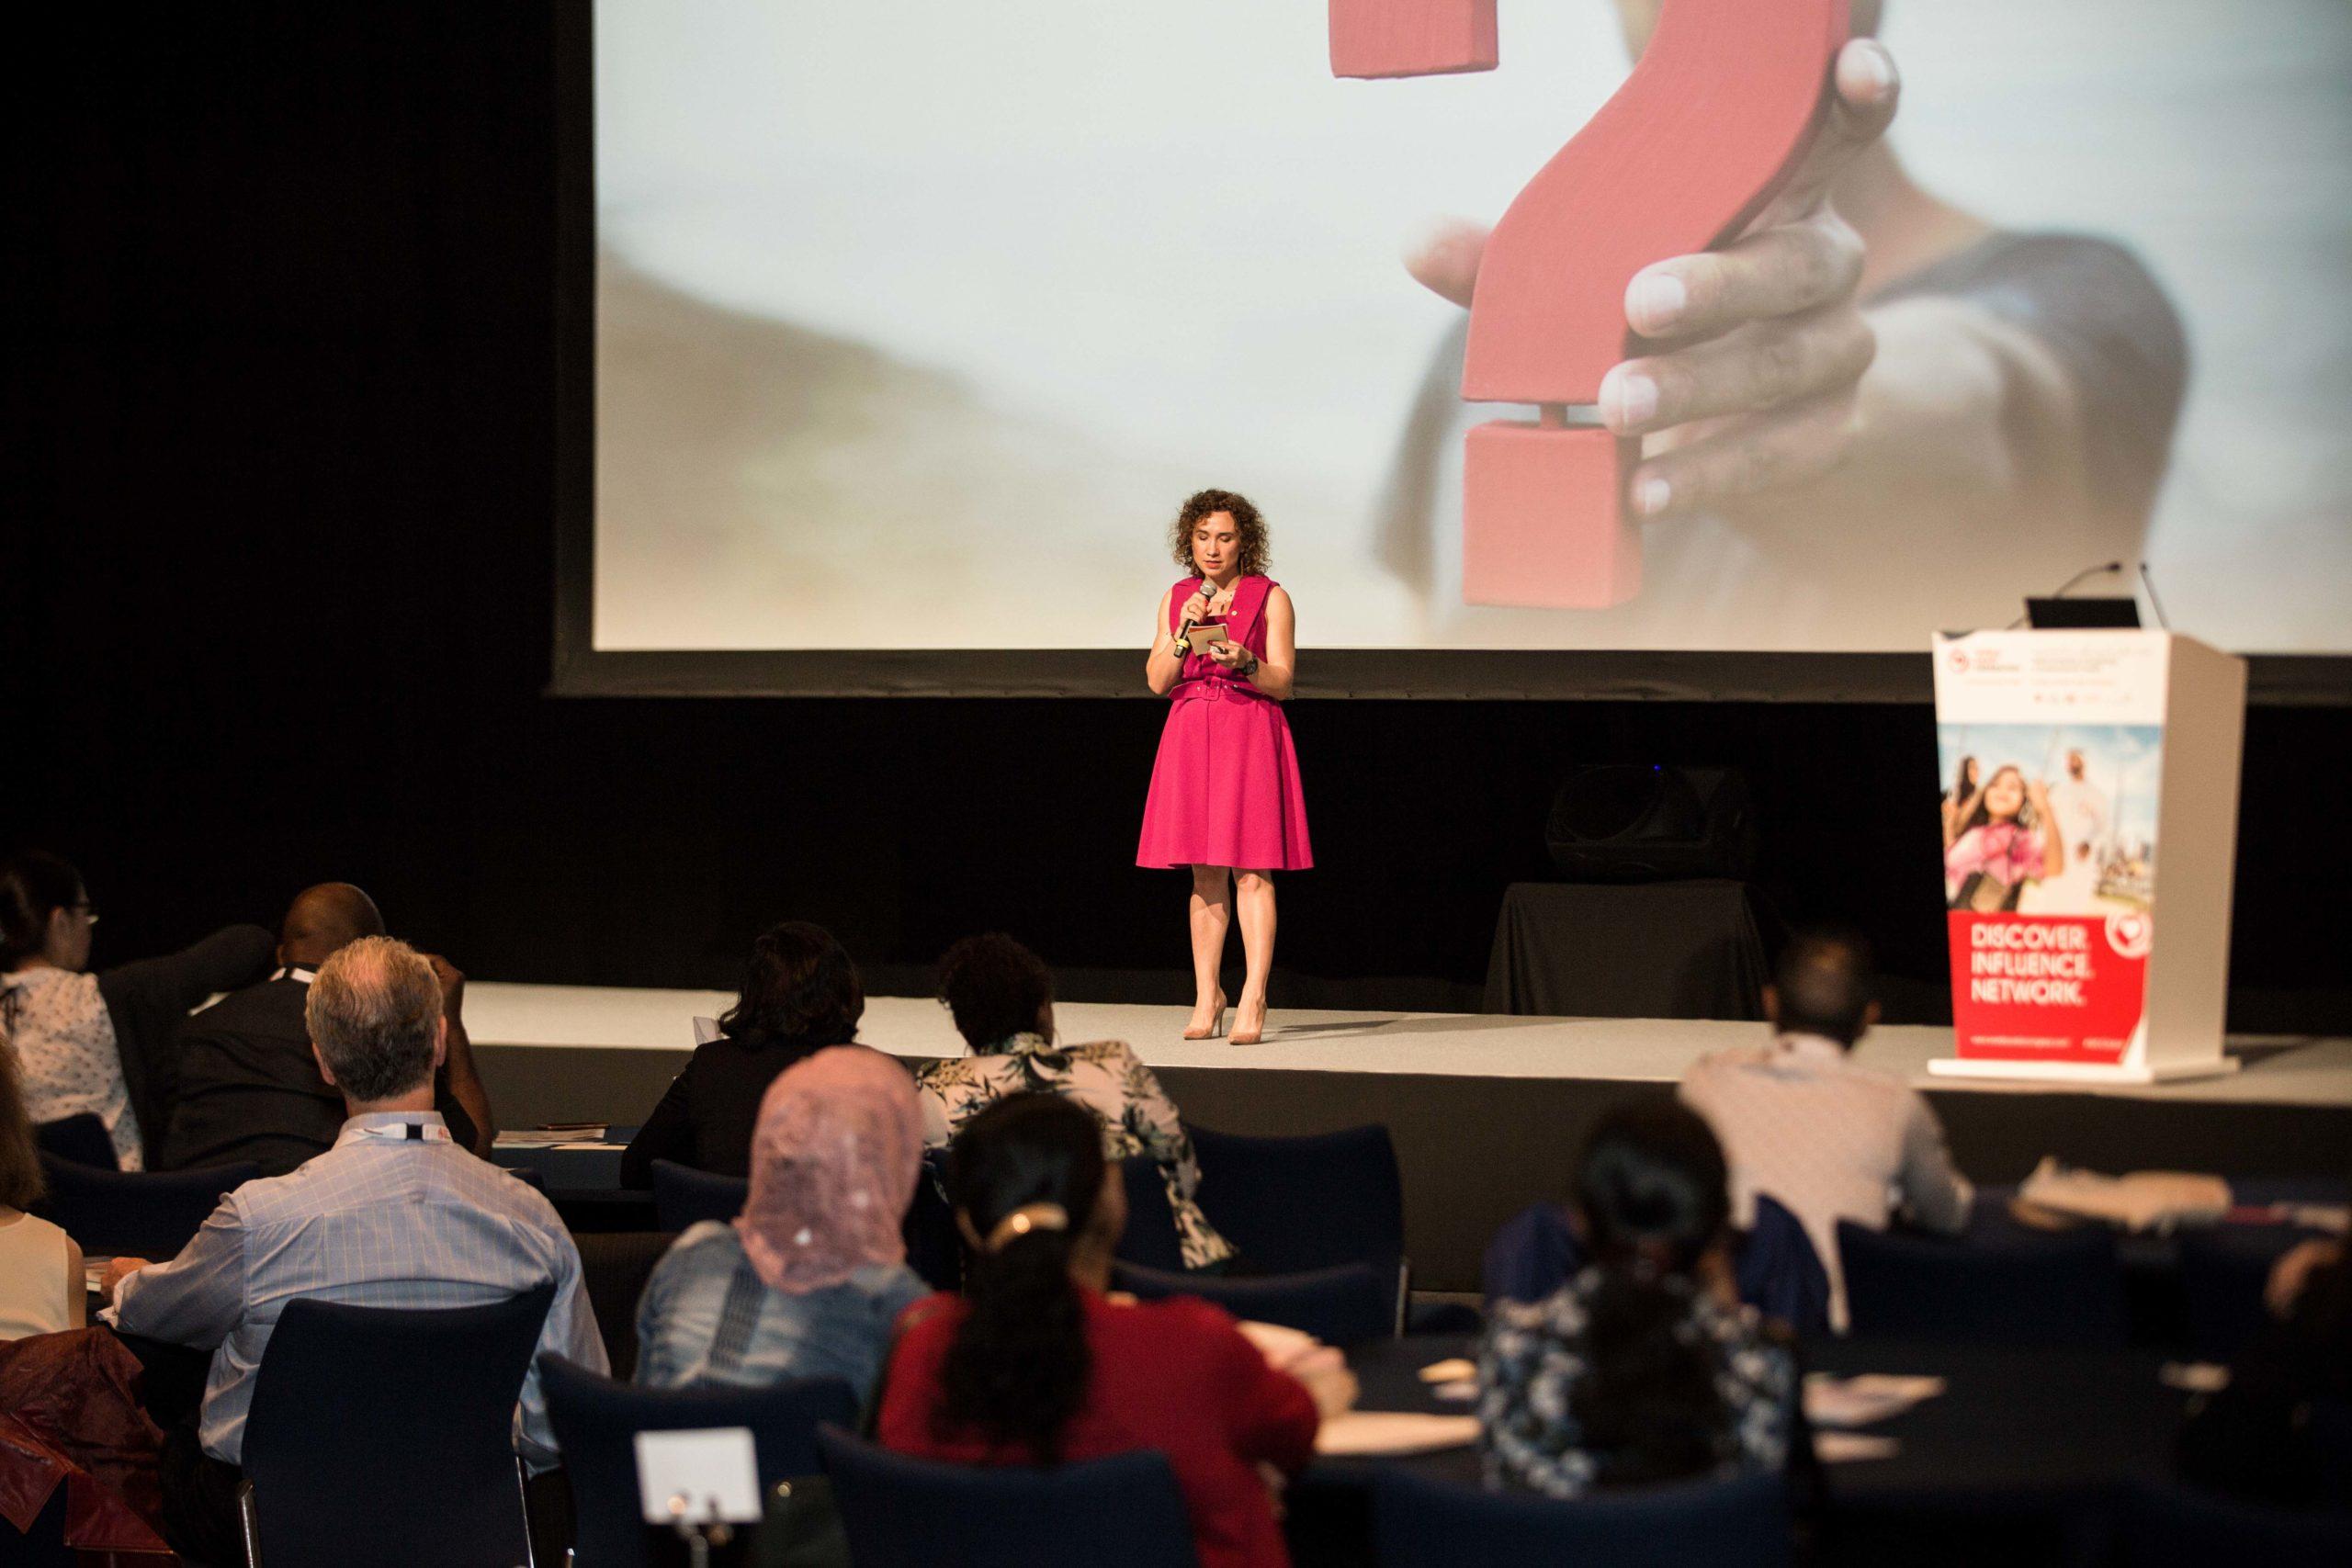 Power speech at the World Congress of Cardiology & Cardiovascular in Dubai in 2018